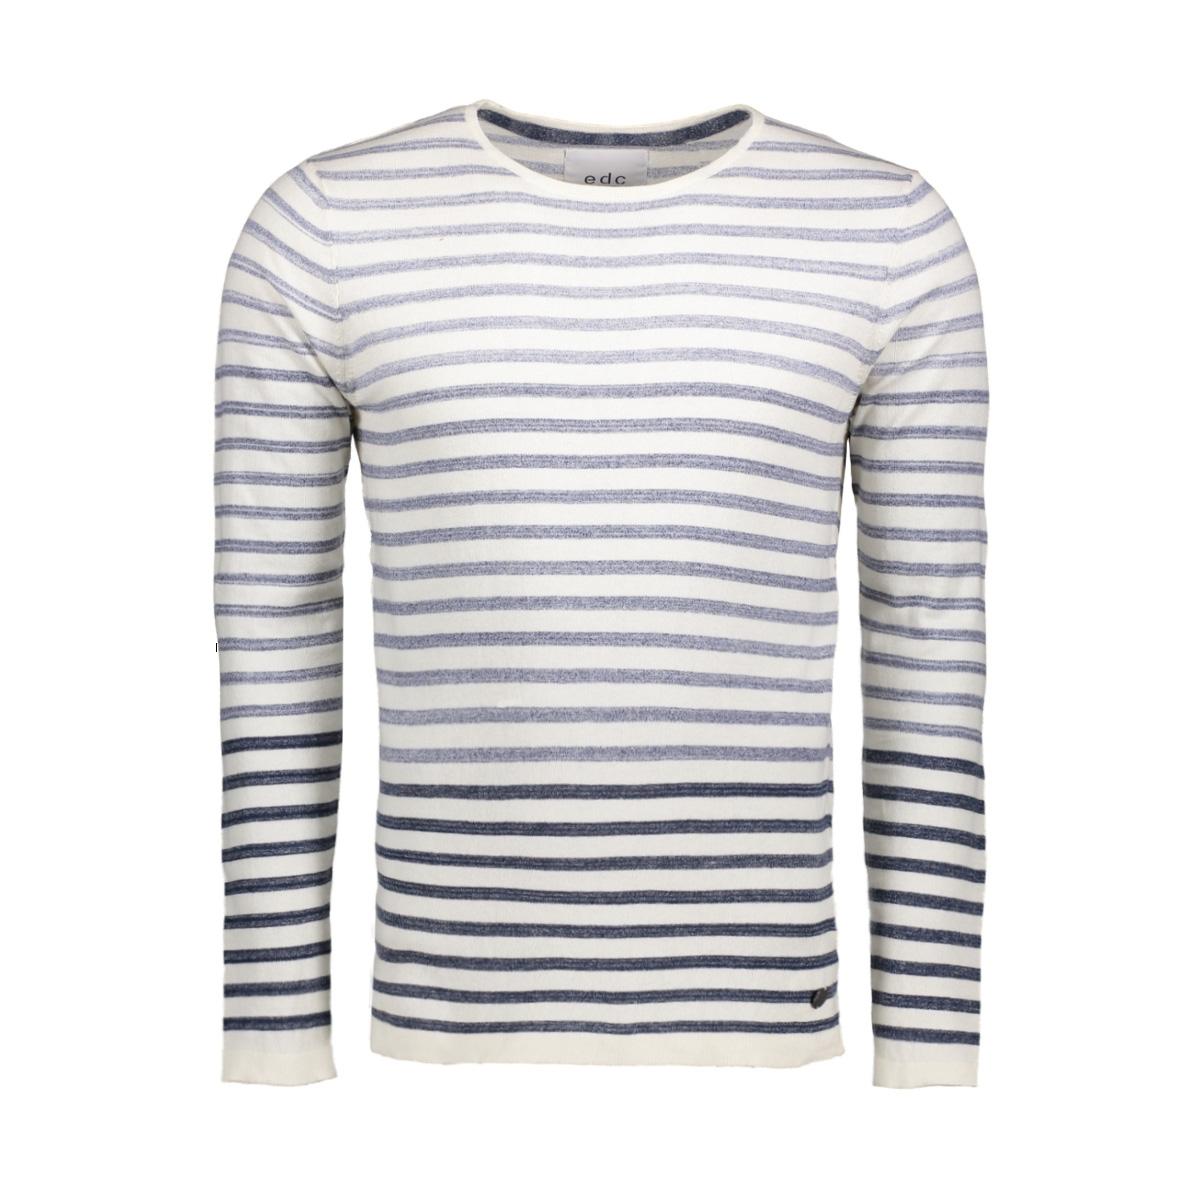 047cc2i006 edc sweater c110